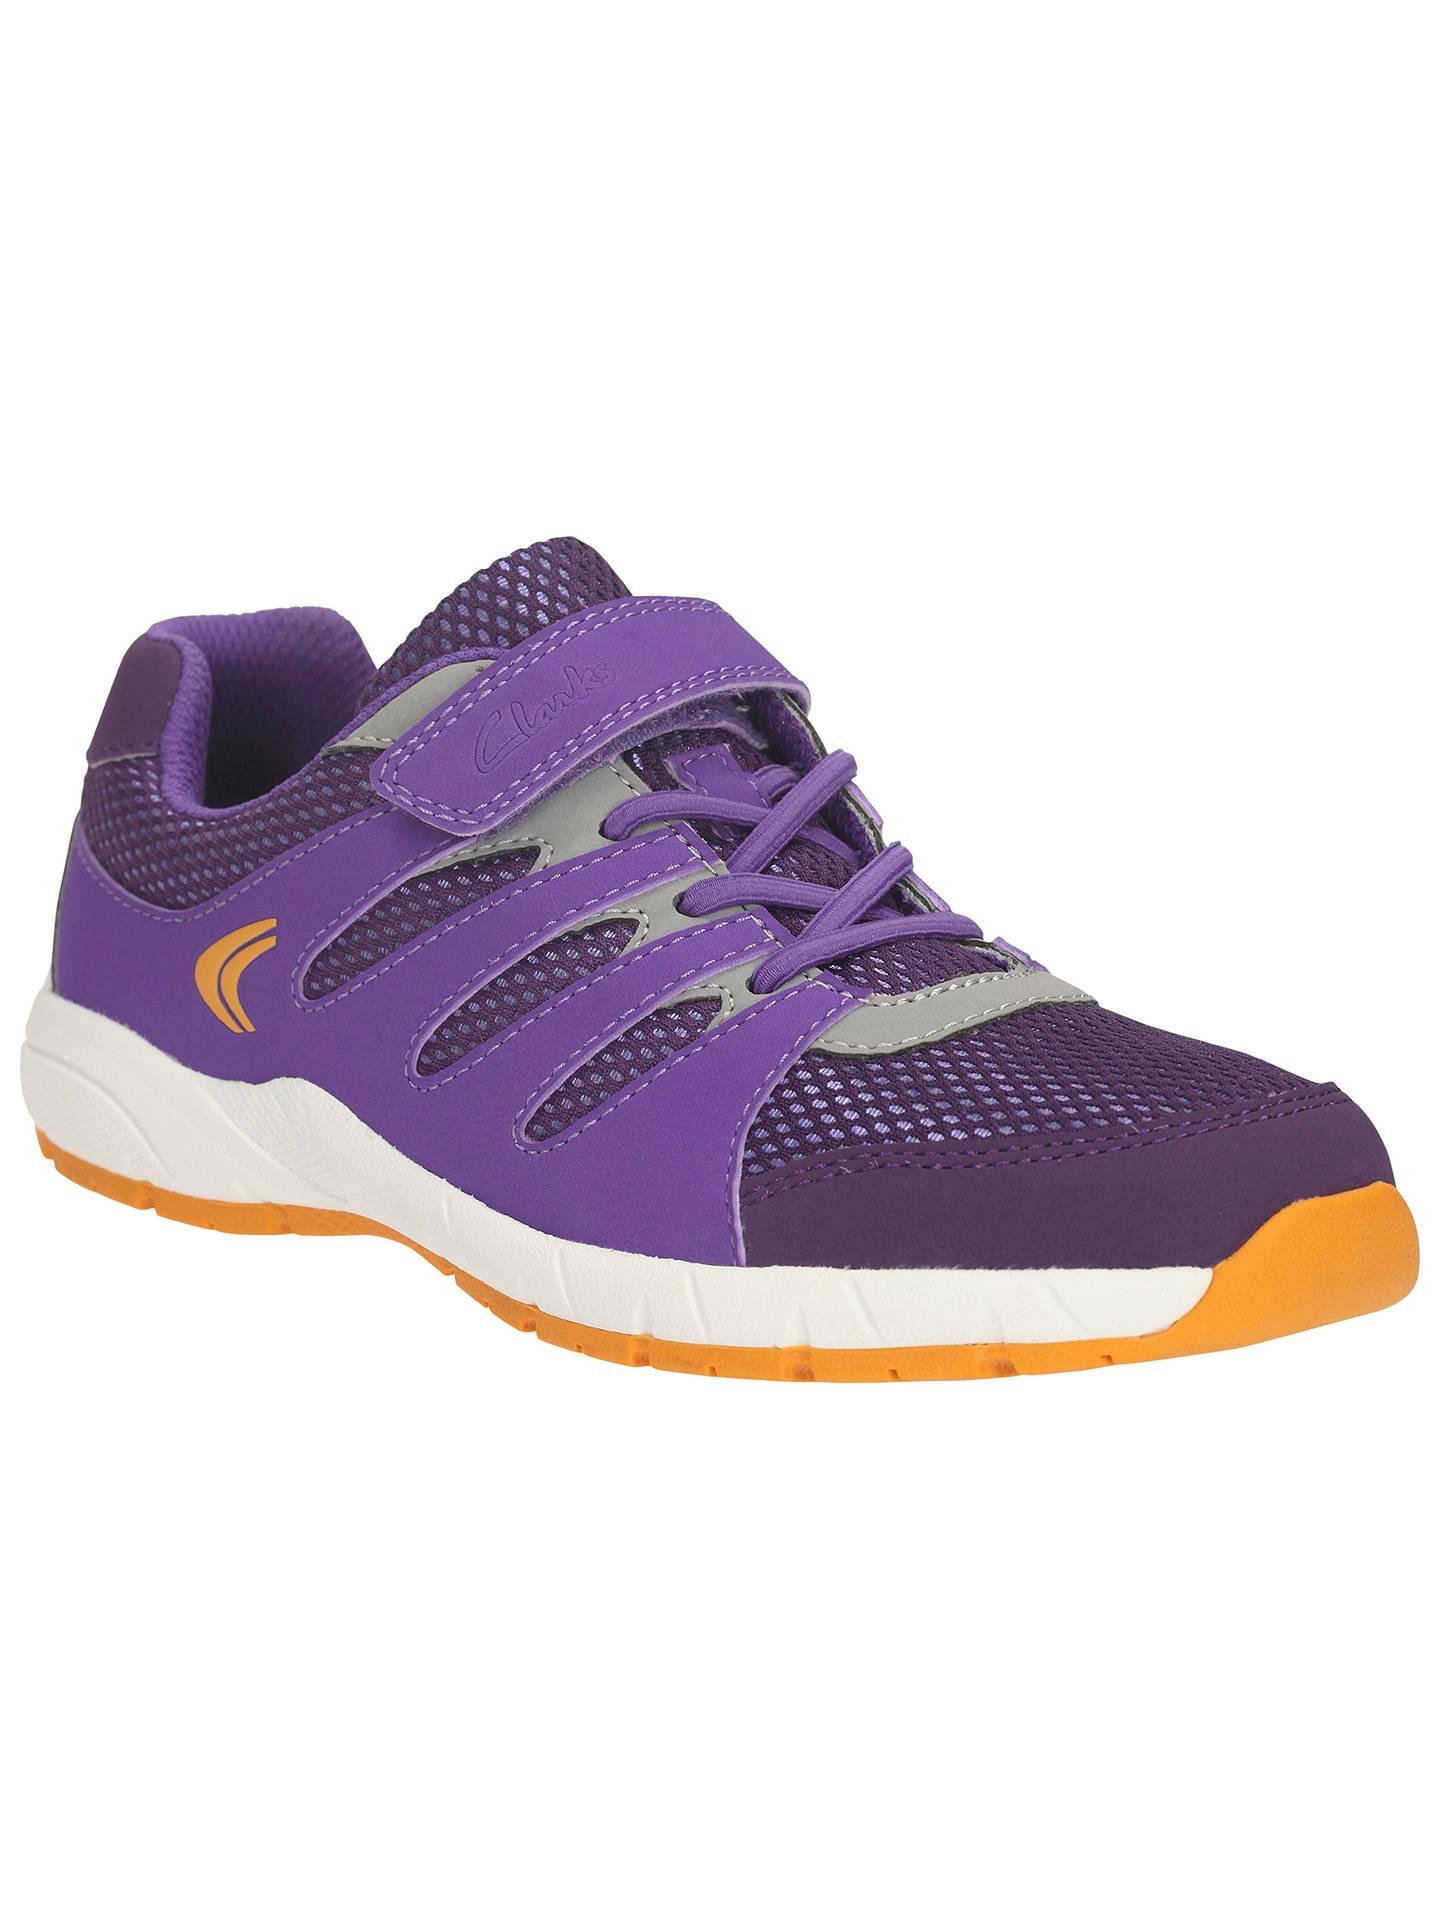 82a2ad18b48c Buy Clarks Cross Dart Sports Shoes